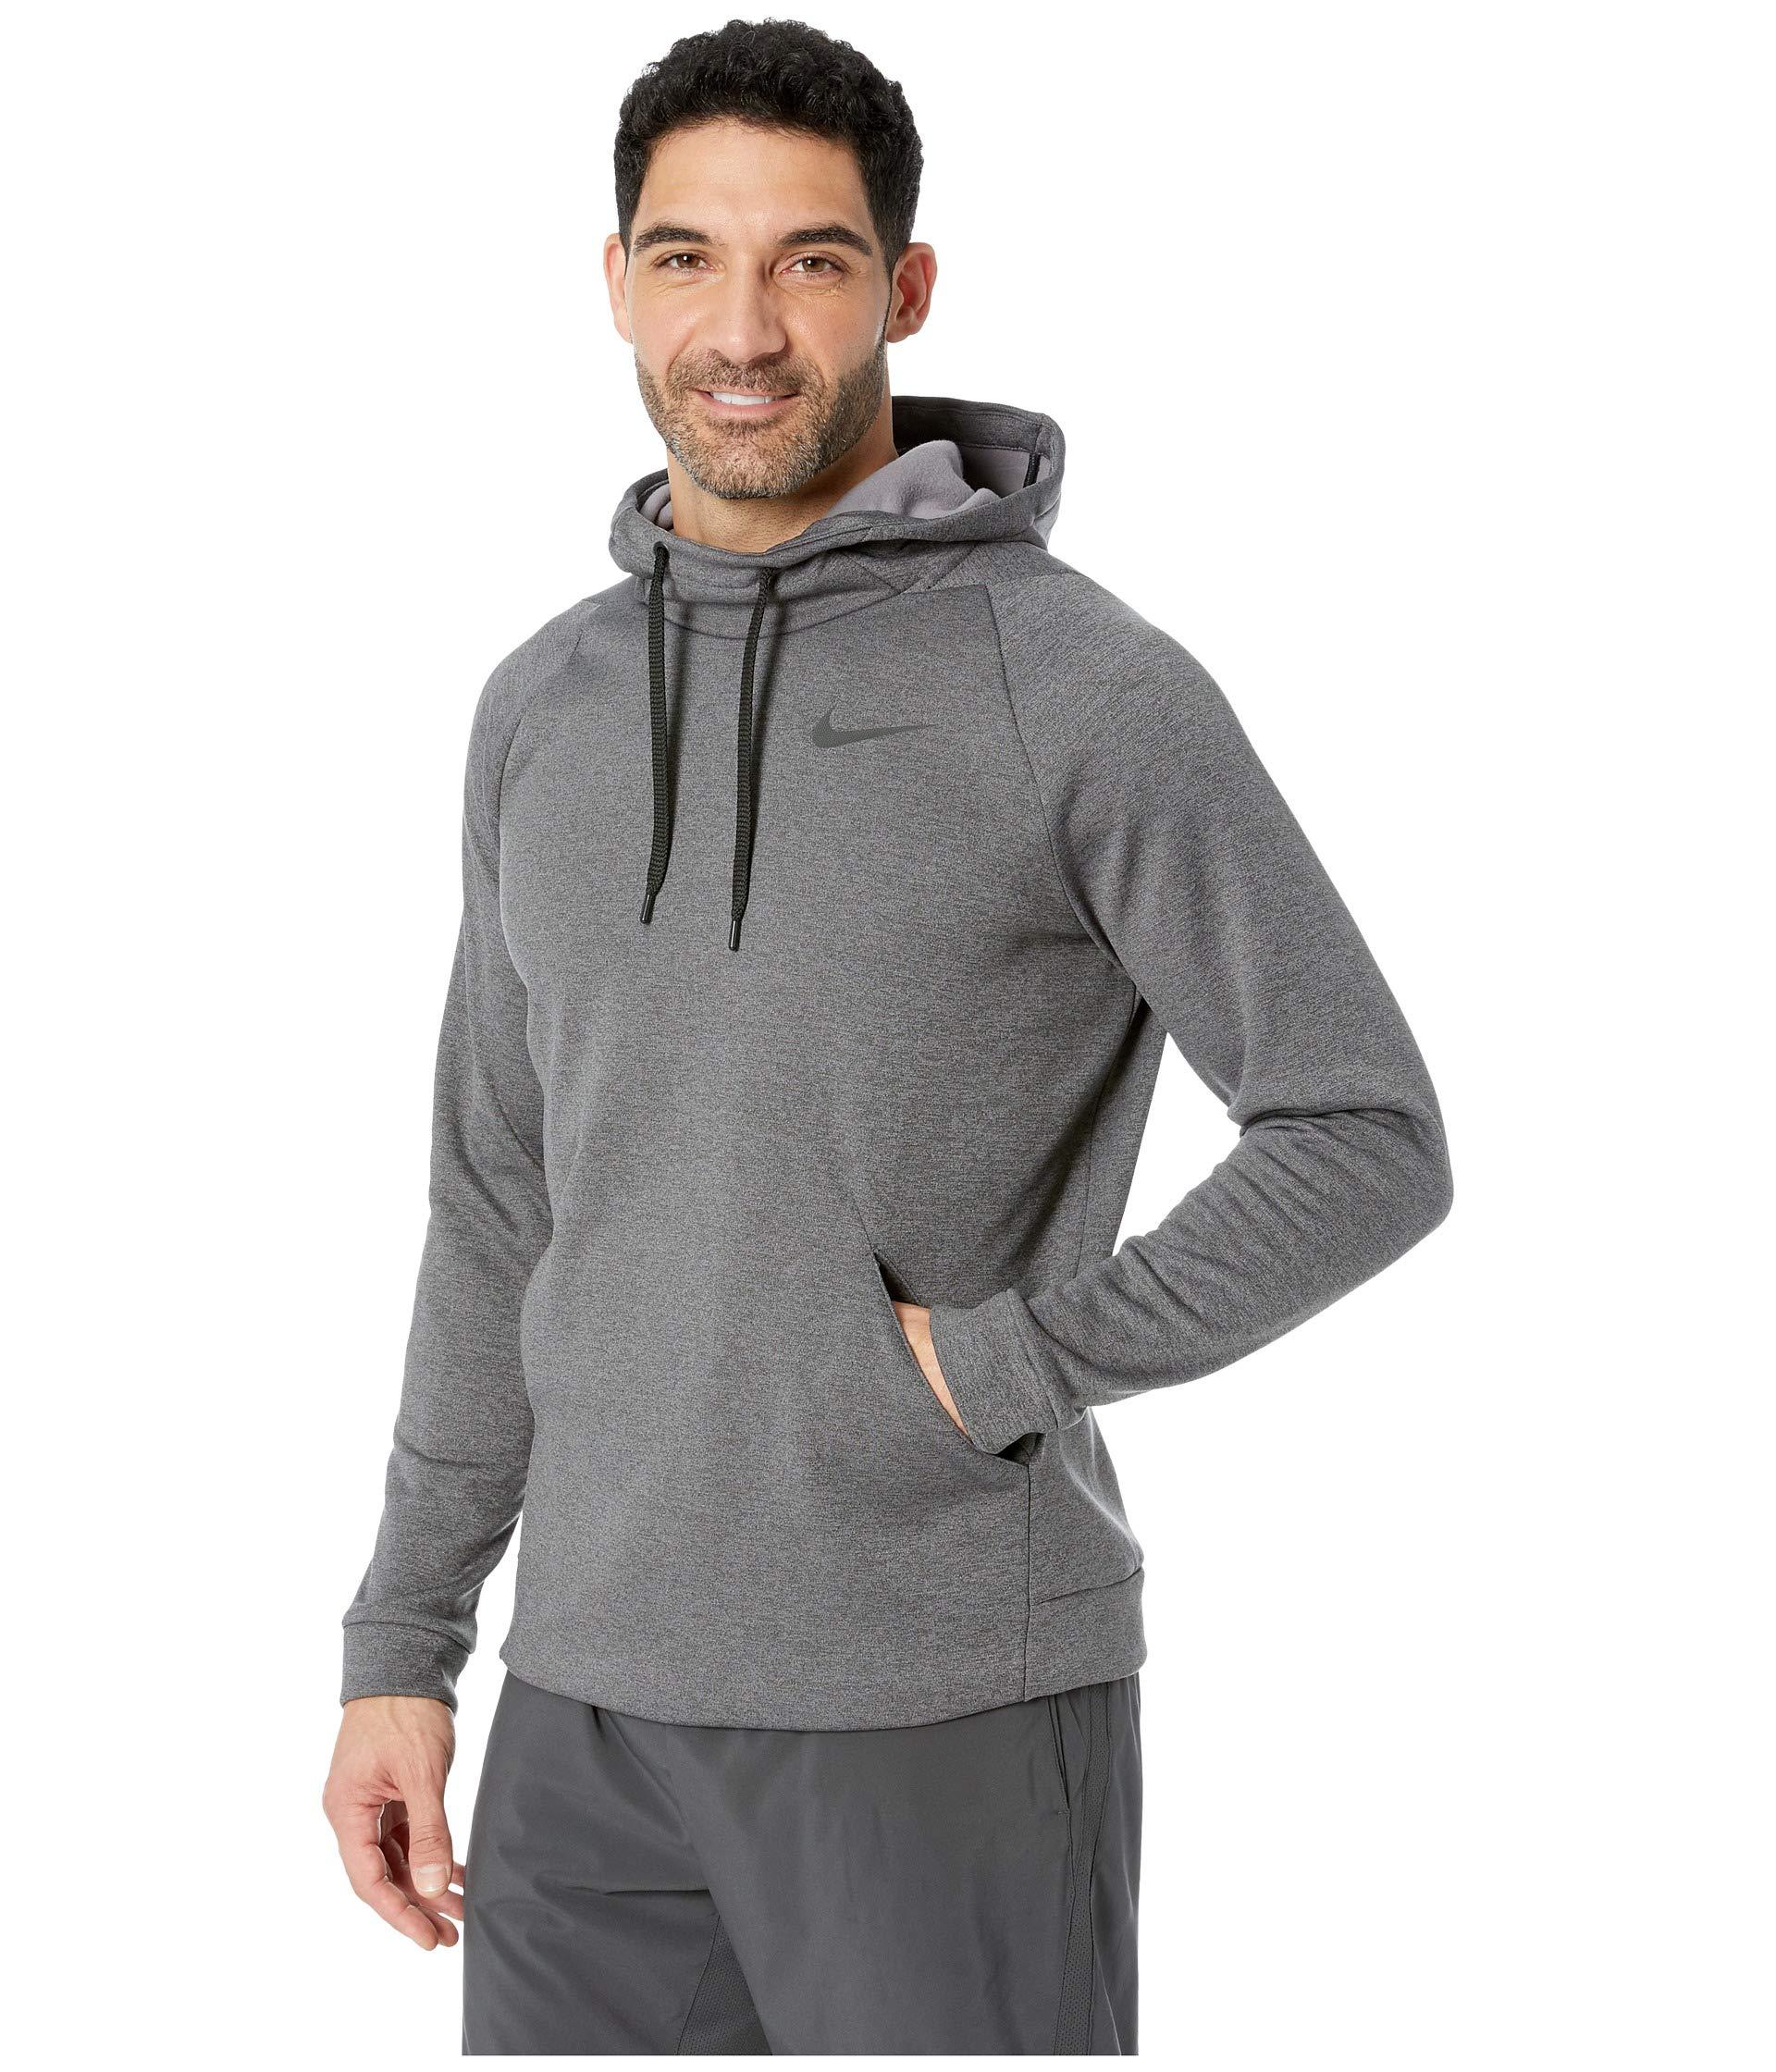 black Nike Heather Thermal Hoodie Pullover Charcoal 4qqHPUwv